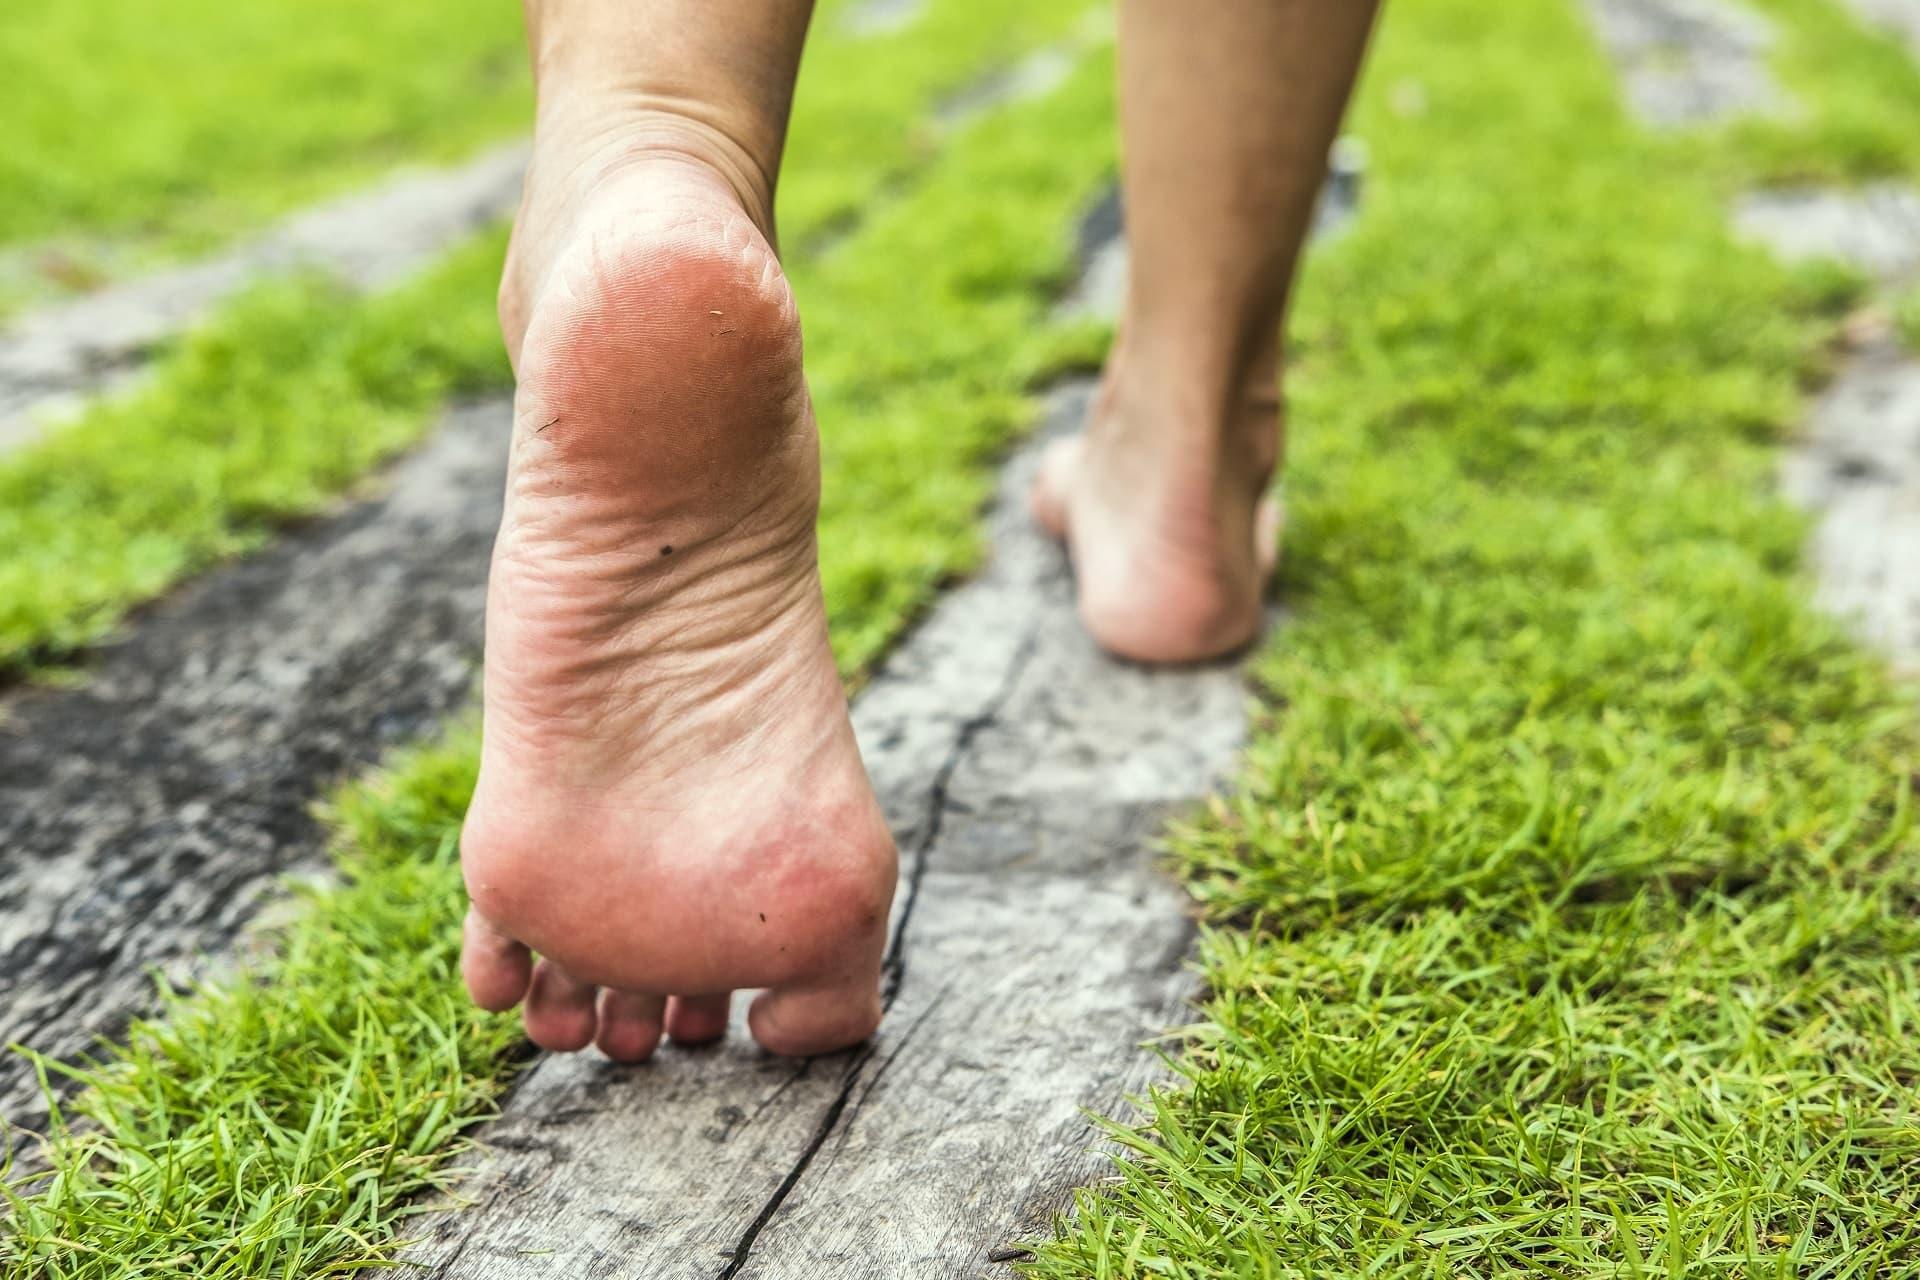 Füße gehen Schritt für Schritt